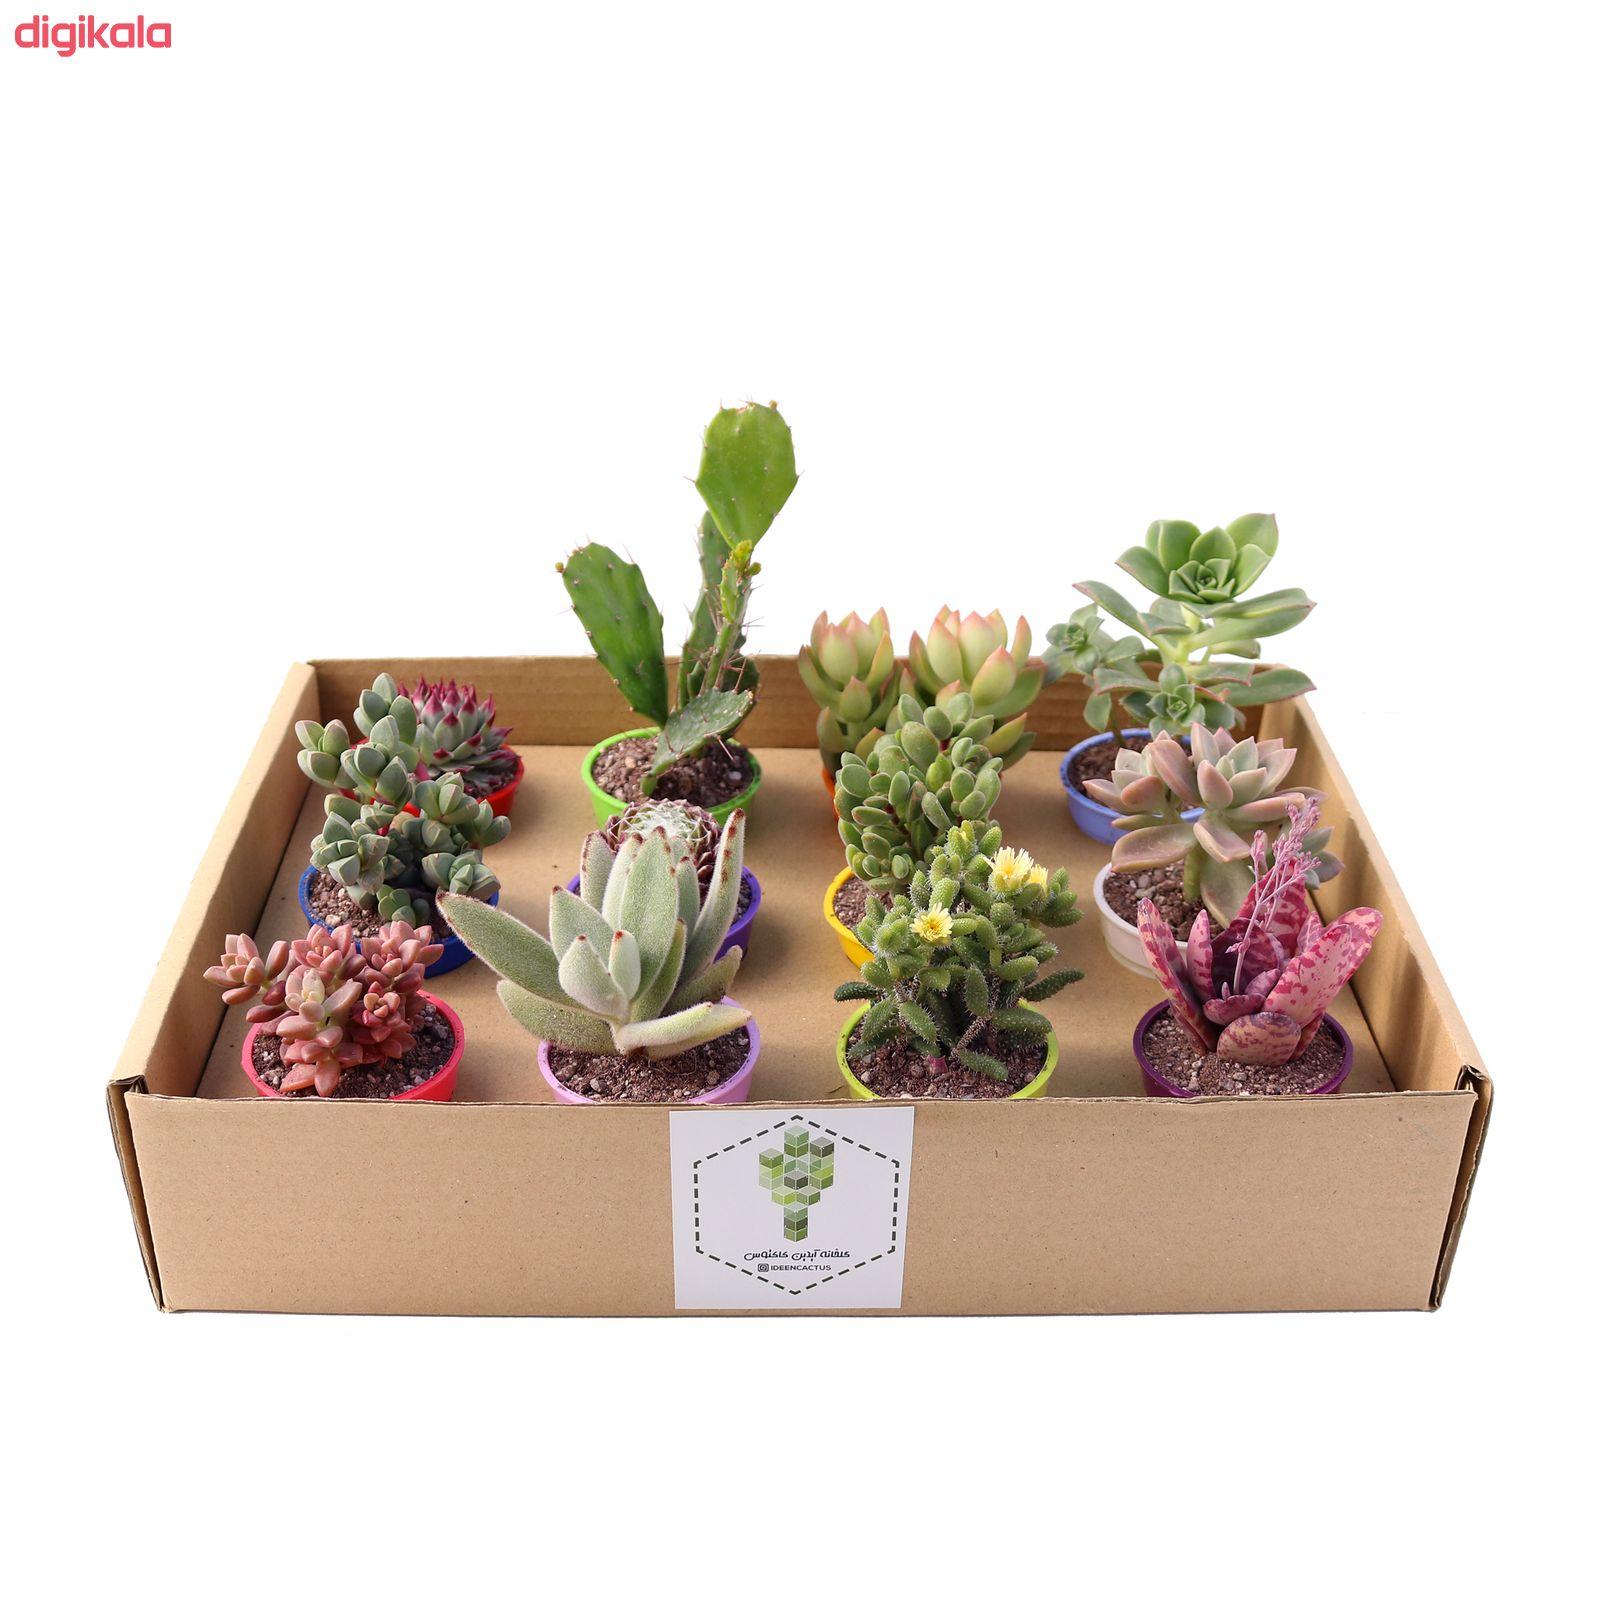 گیاه طبیعی کاکتوس و ساکولنت آیدین کاکتوس کد CB-004 بسته 12 عددی main 1 4